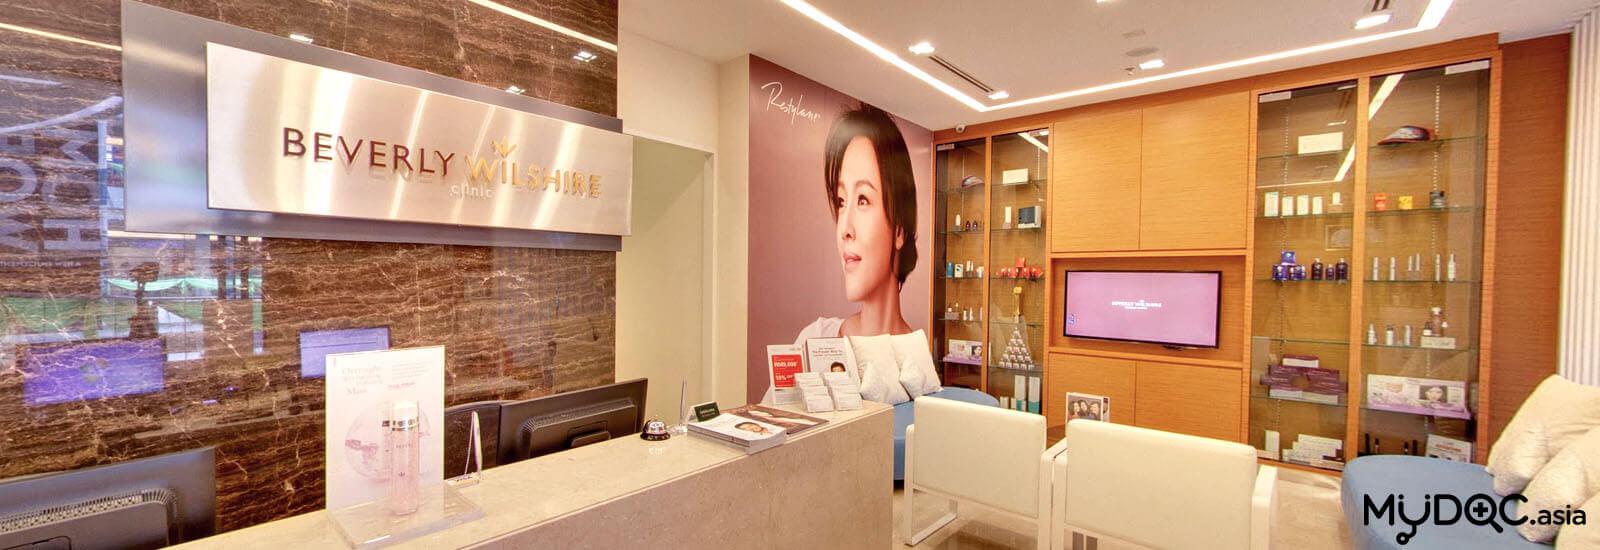 Beverly Wilshire Clinic (Petaling Jaya)